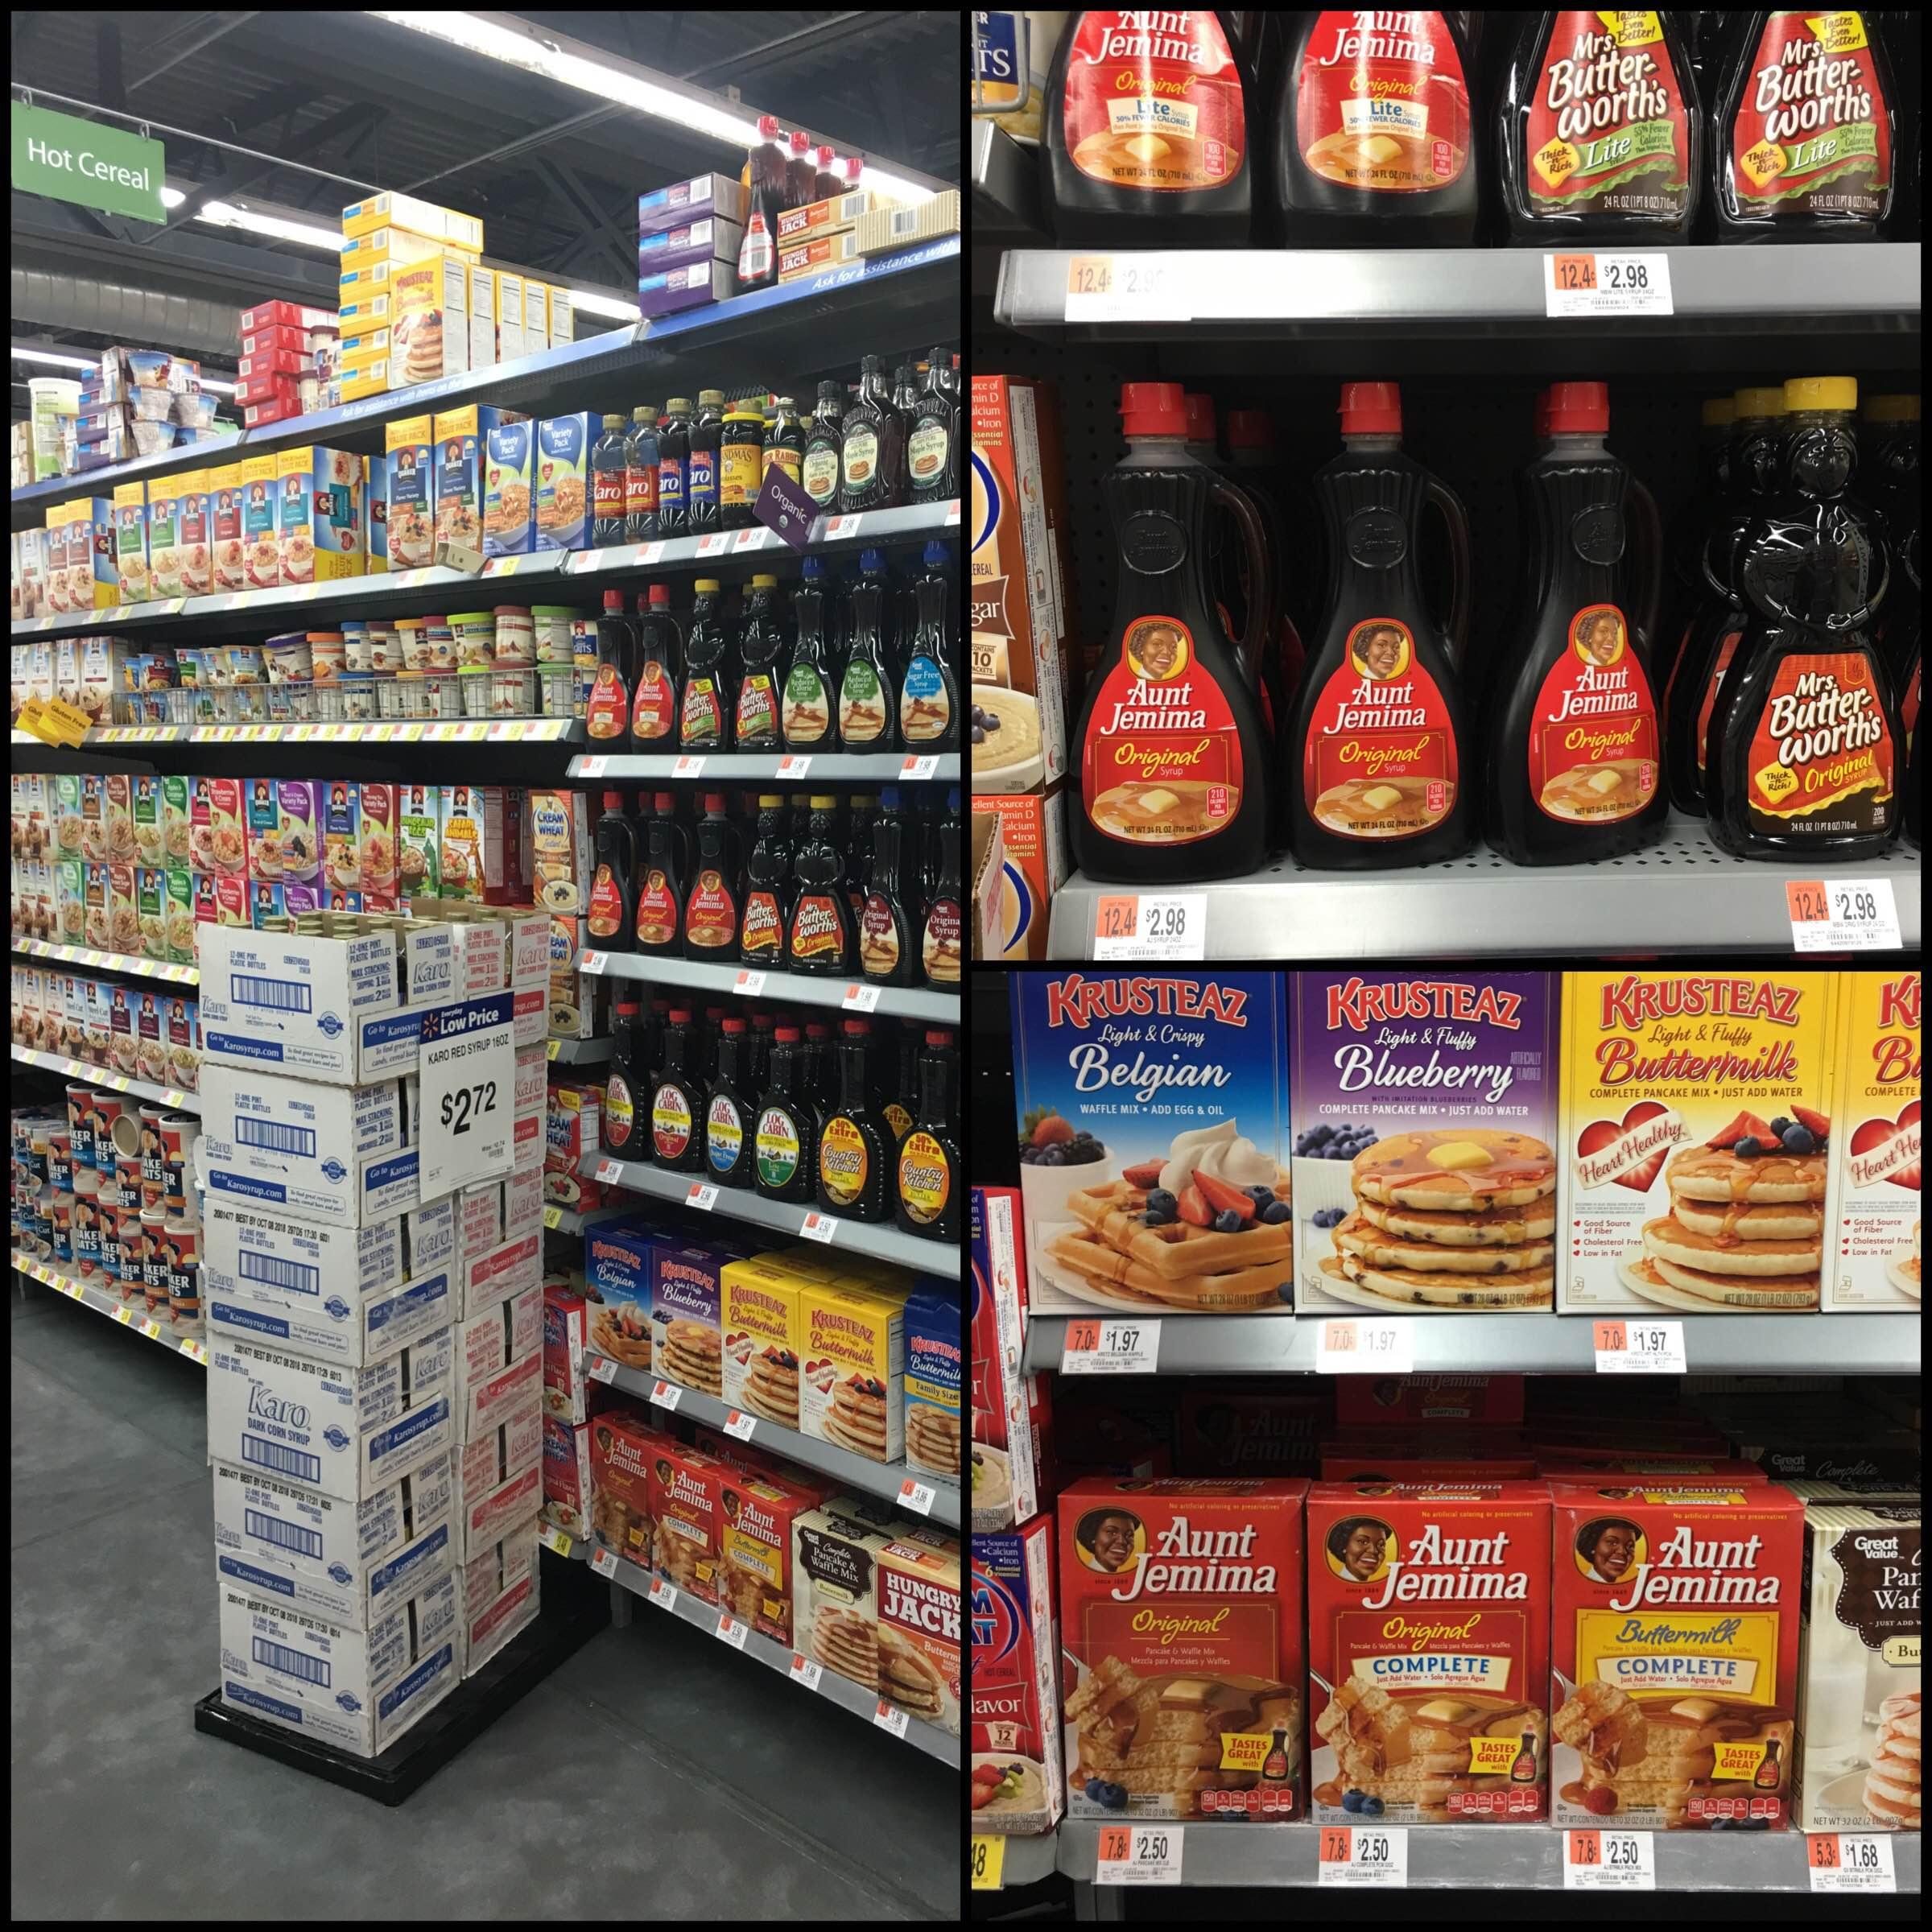 S'mores Pancakes - Let's Mingle Blog